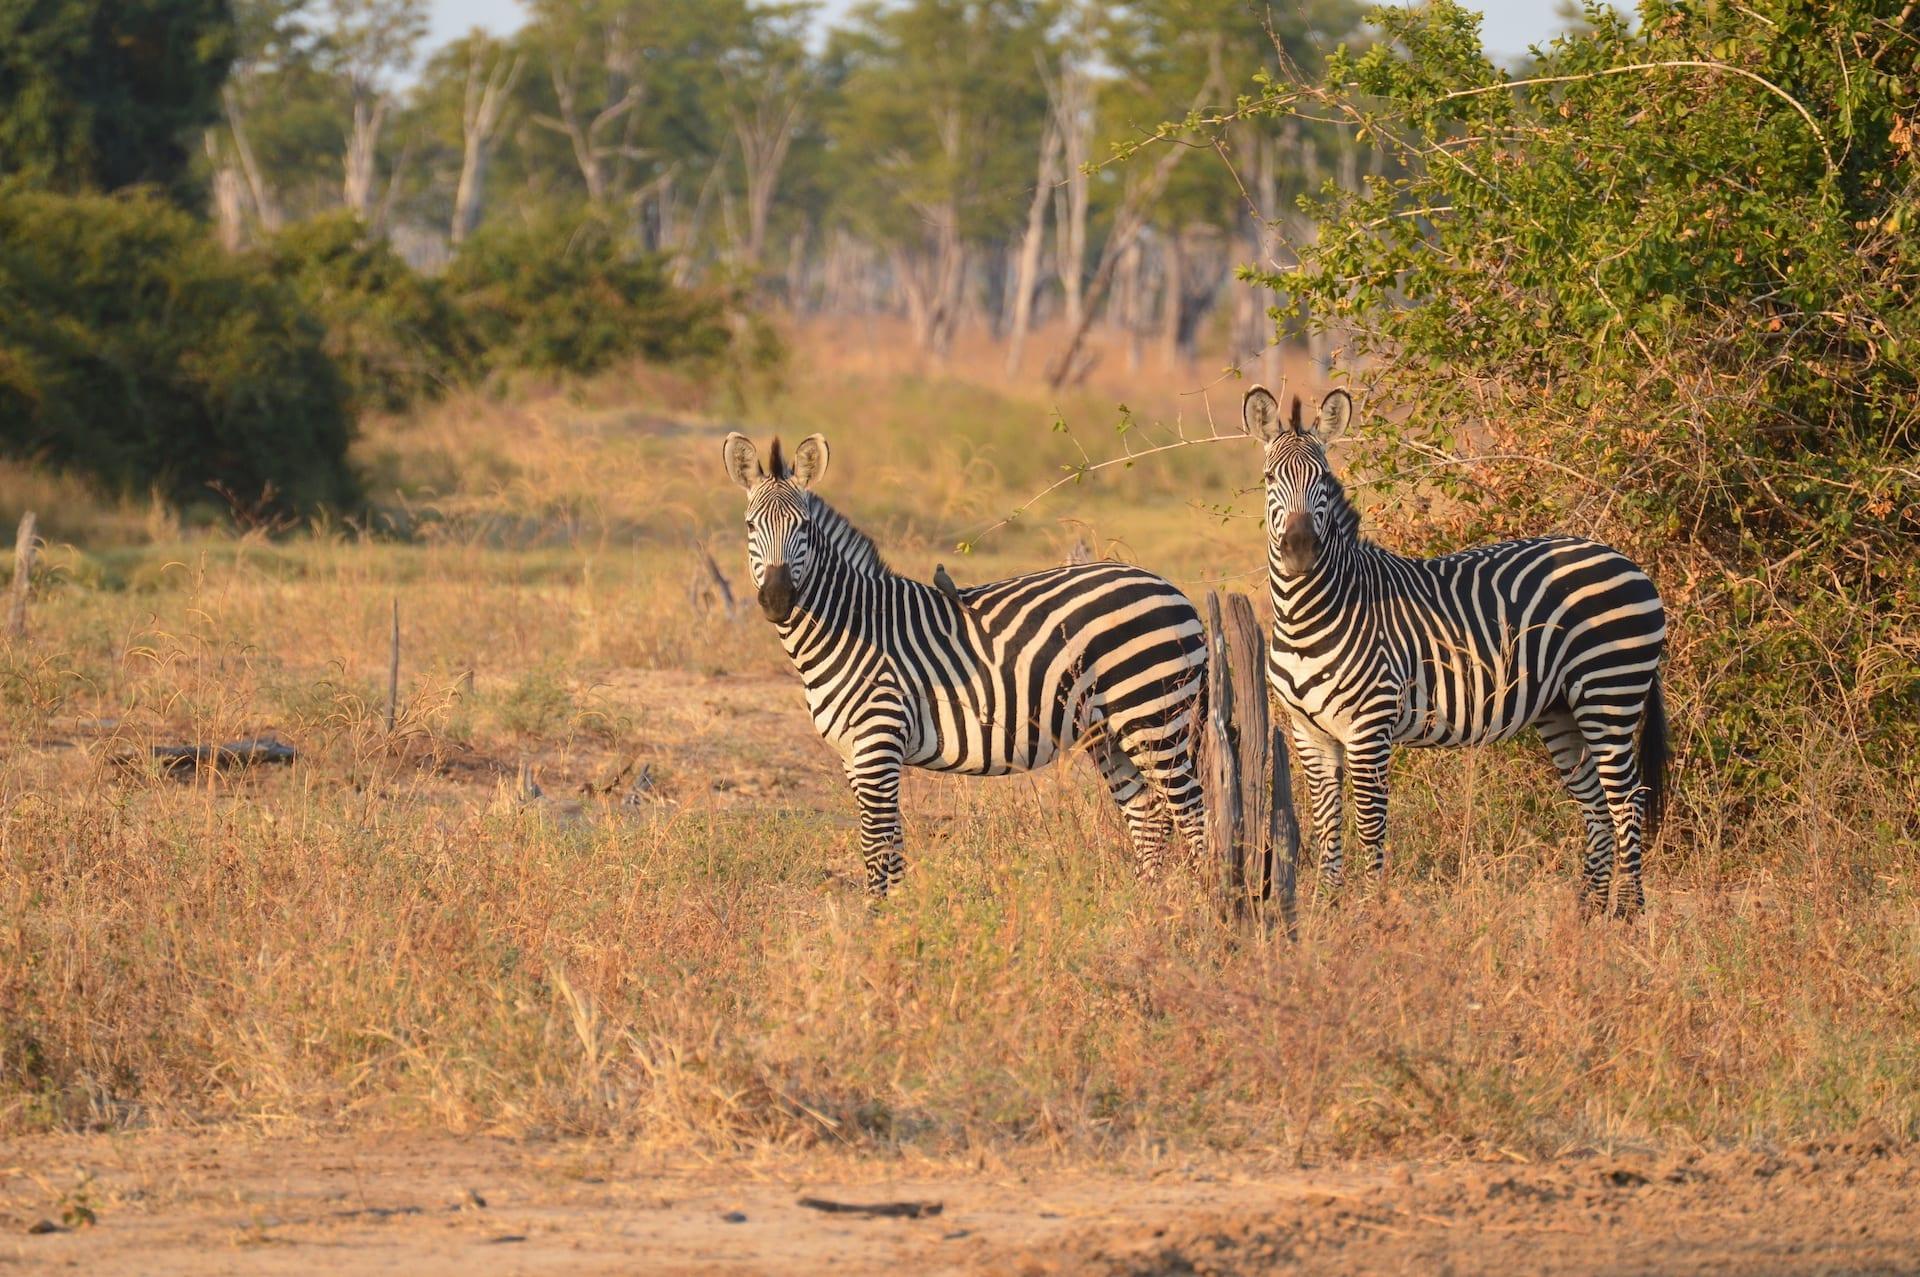 ALGEMEEN - ZAM - Zebra's Mwamba 0466